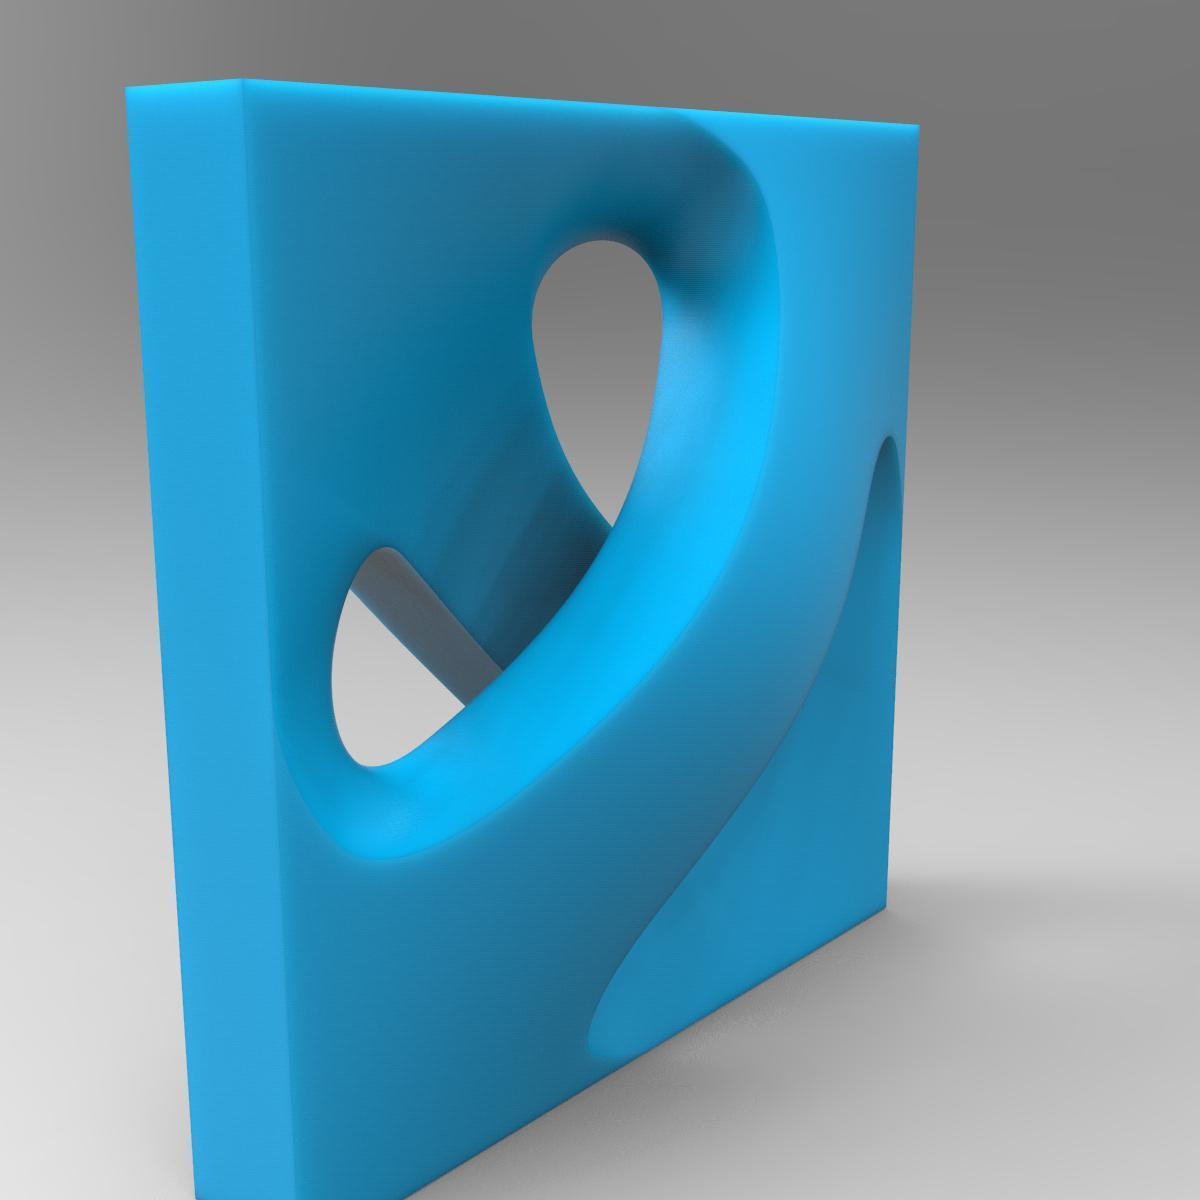 JPG__untitled.33.jpg Download STL file Modular unit • Model to 3D print, 6cubes